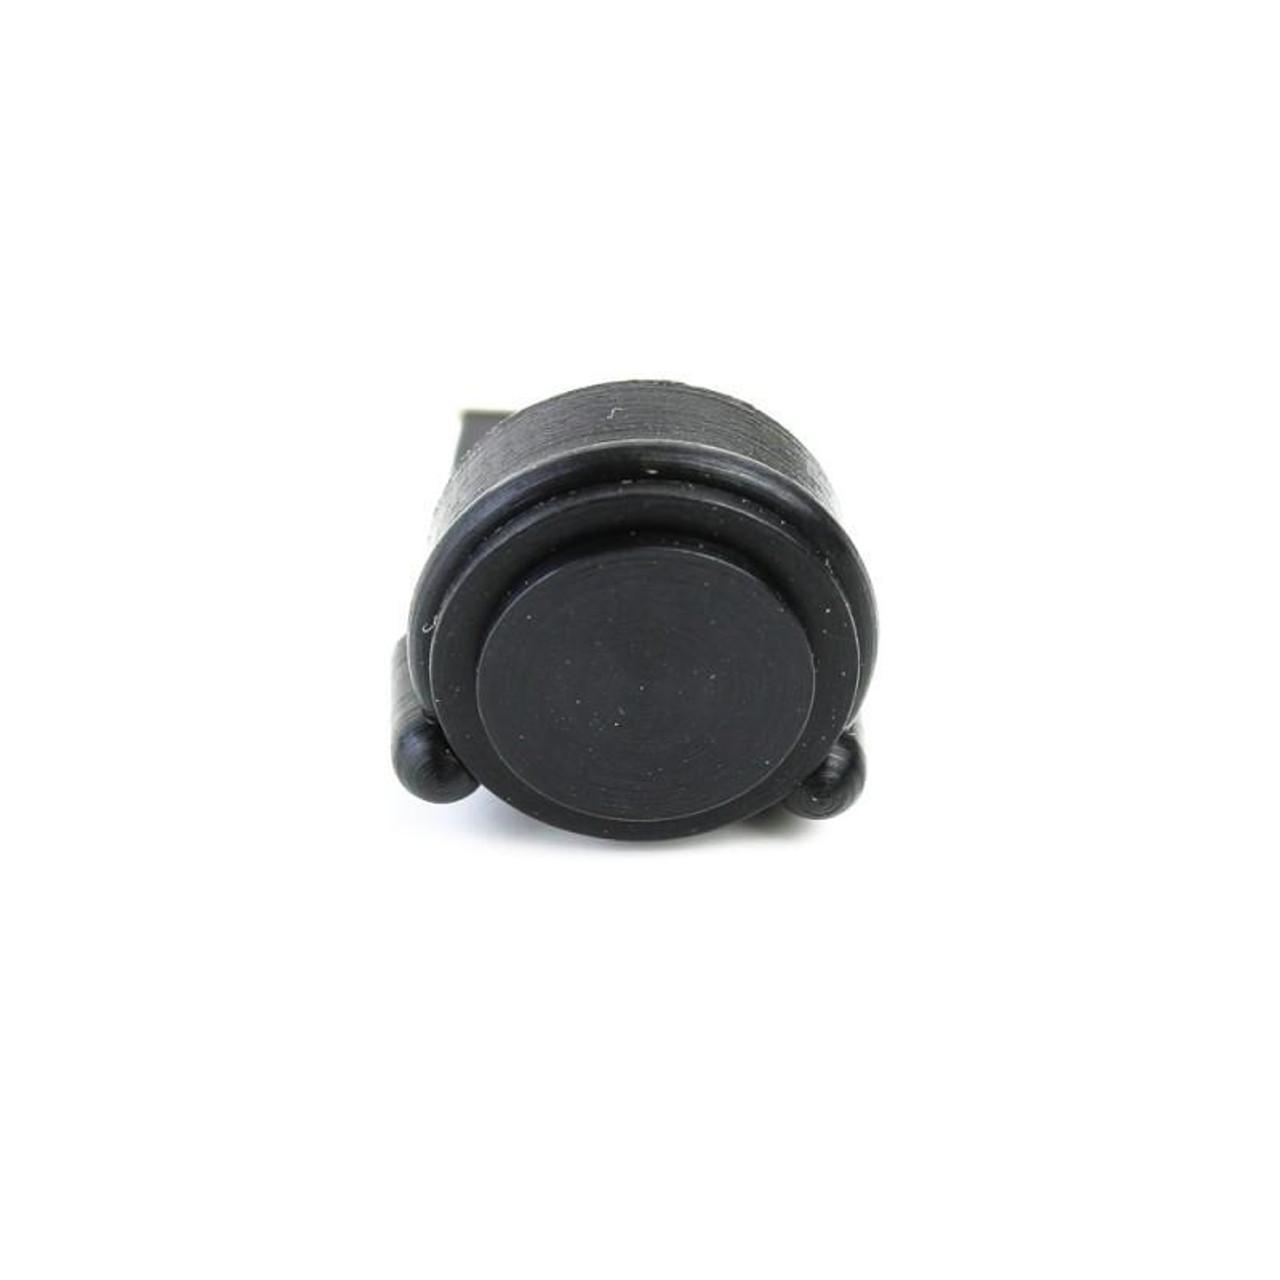 AR-15 Accu Wedge Upper/Lower Receiver Buffer -Black